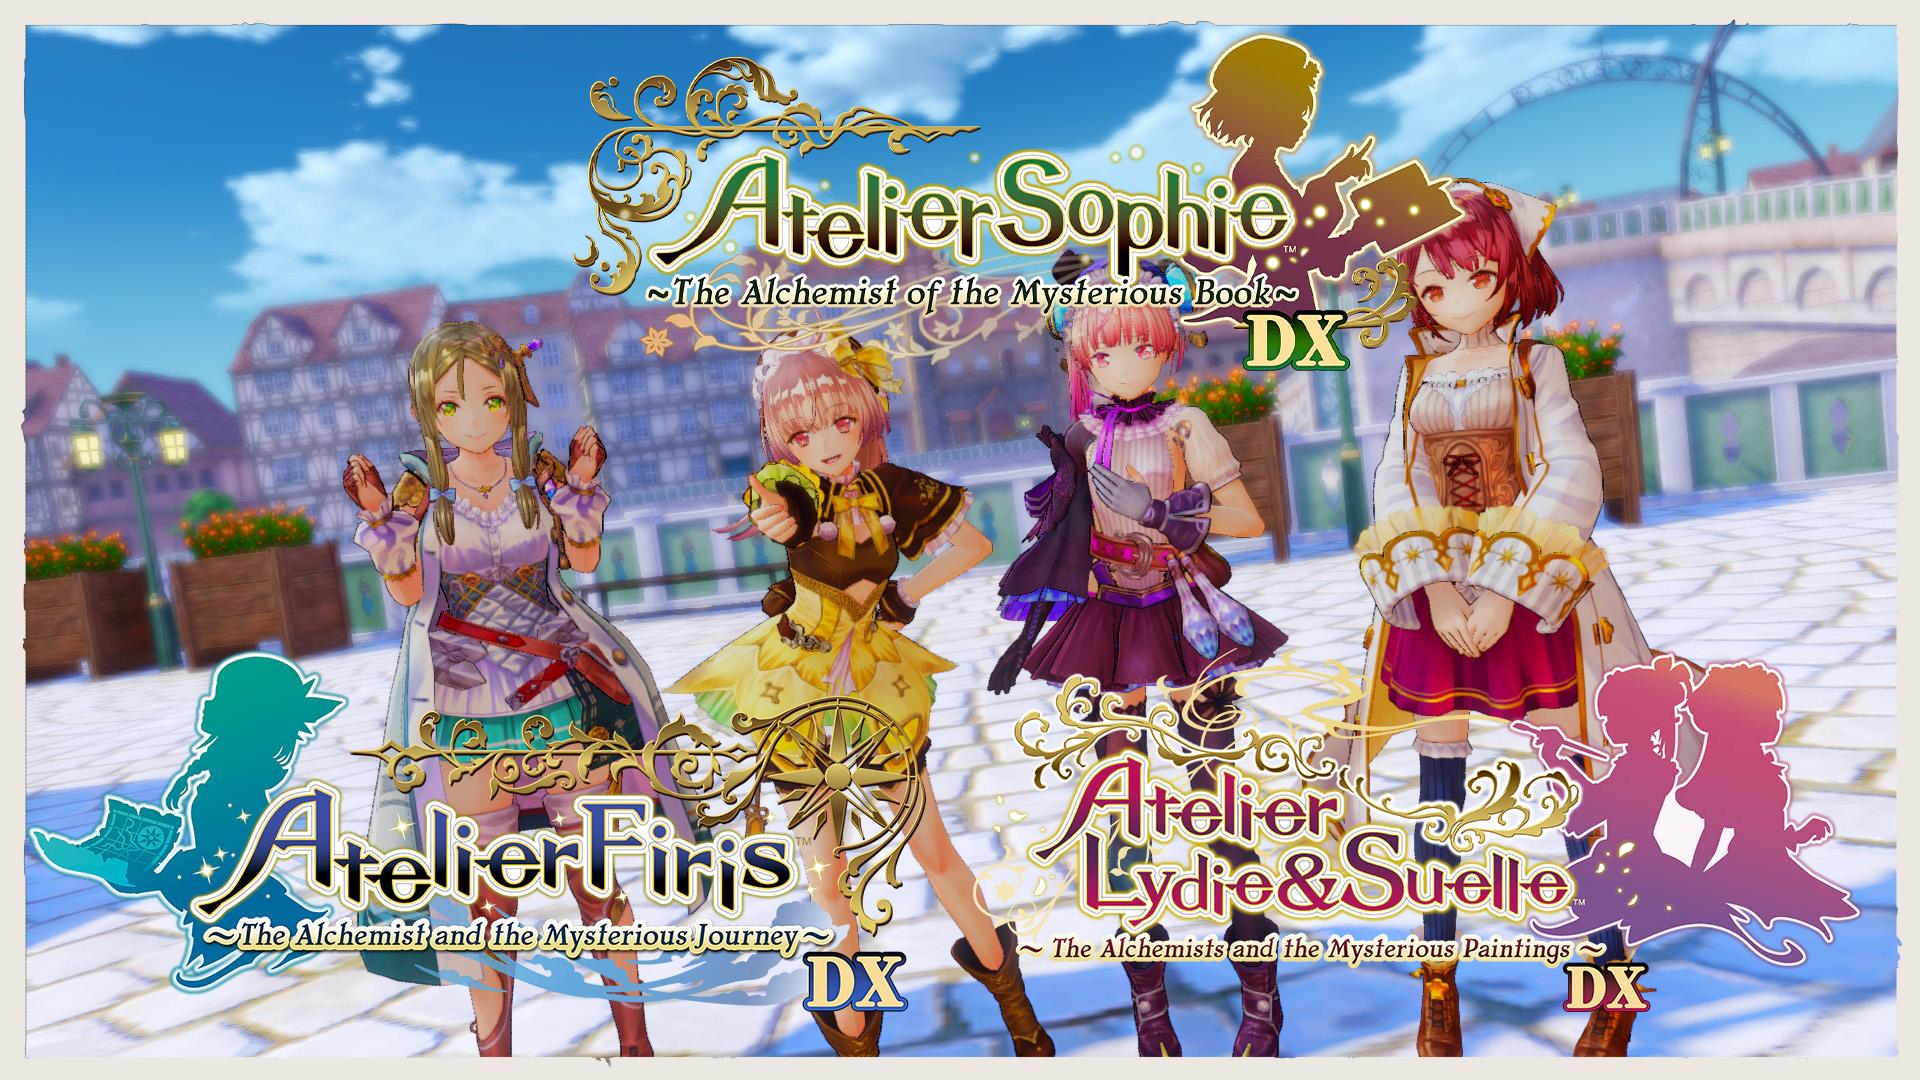 Atelier Mysterious Trilogy Main